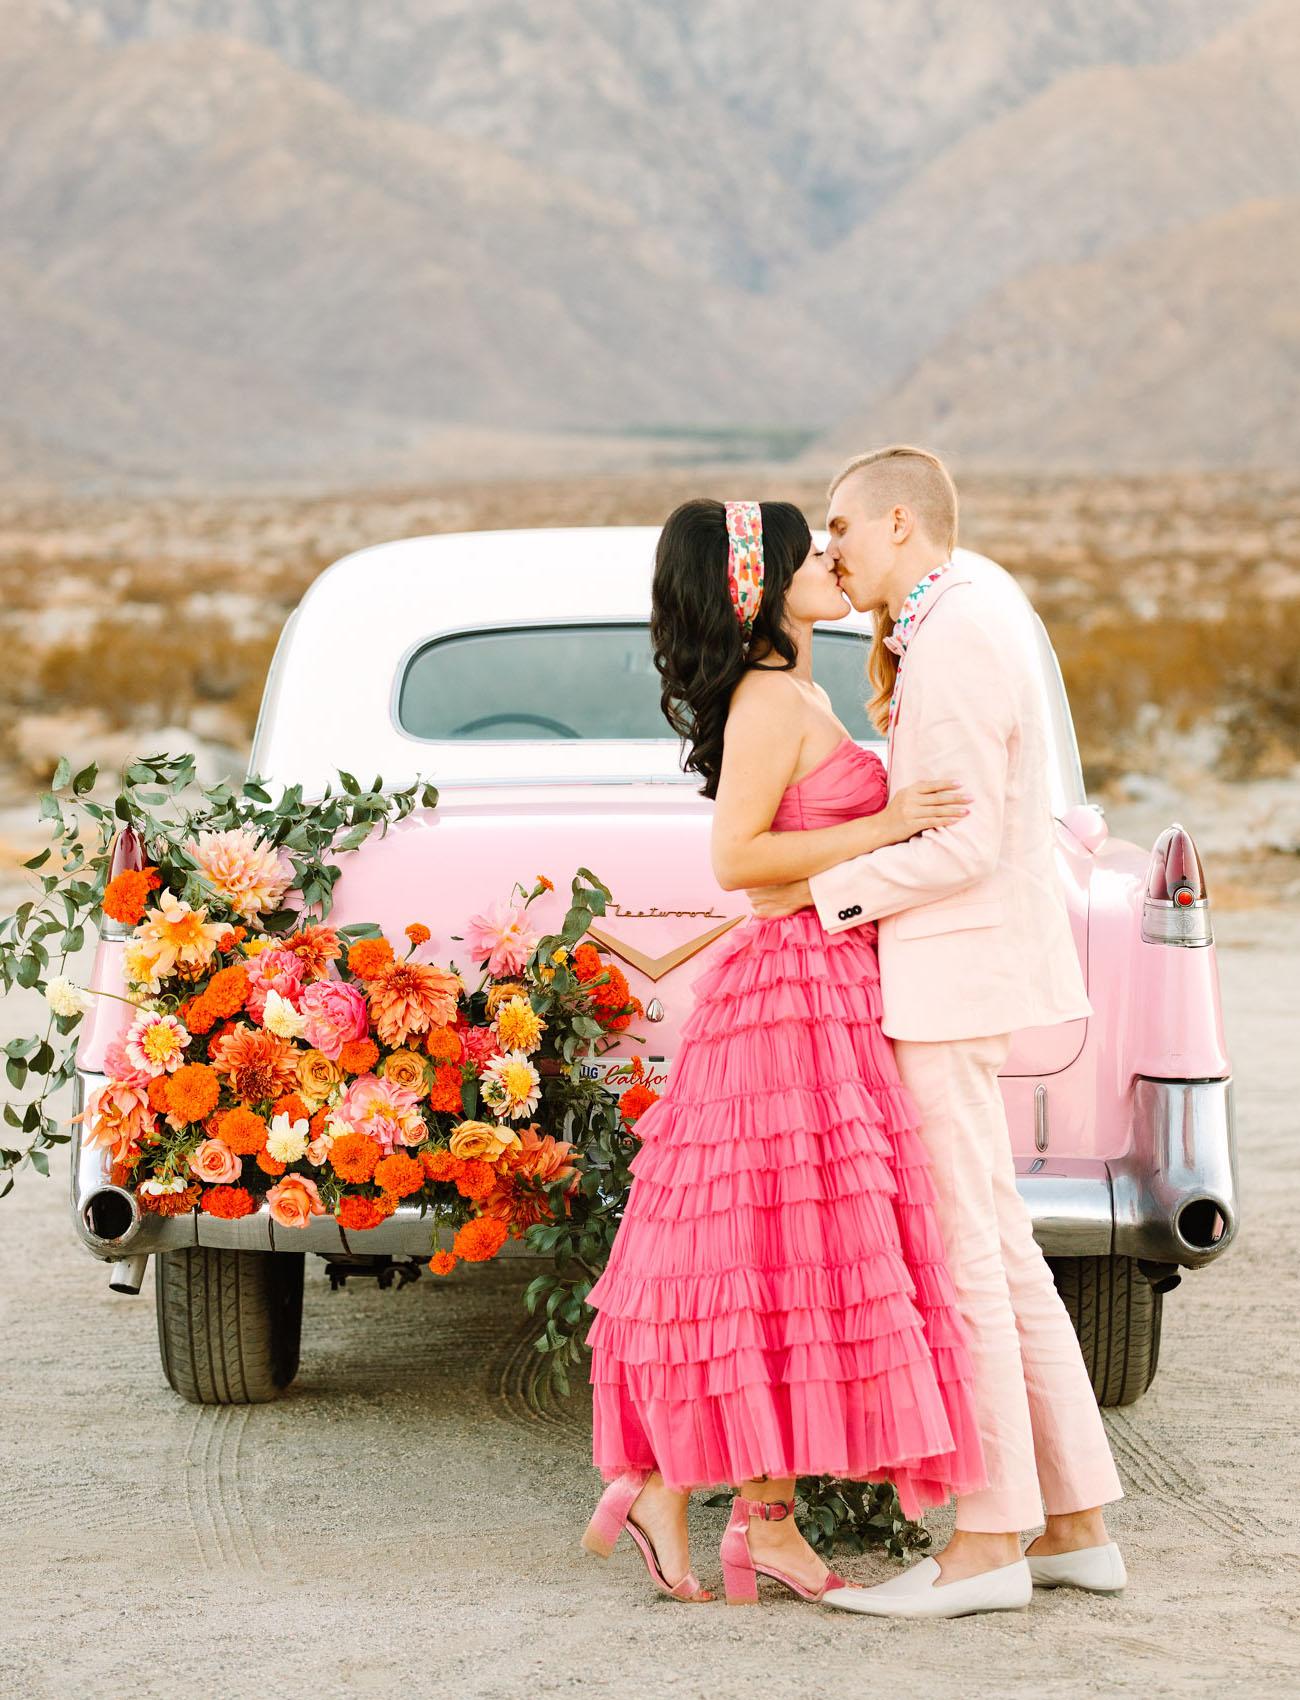 Bruidspaar bij roze Cadillac